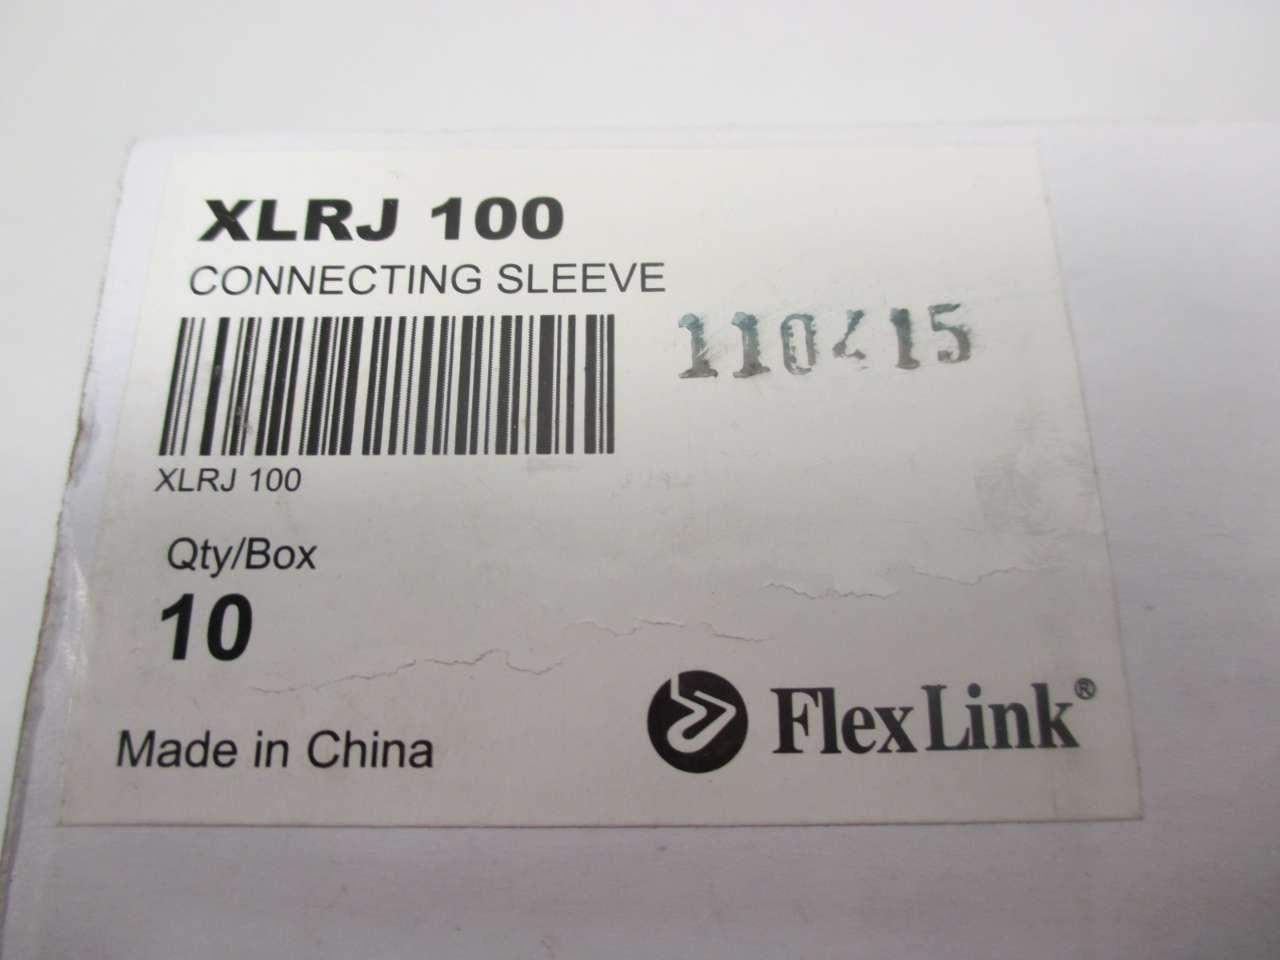 Connecting Sleeve Box of 10 NEW XLRJ 100 FlexLink